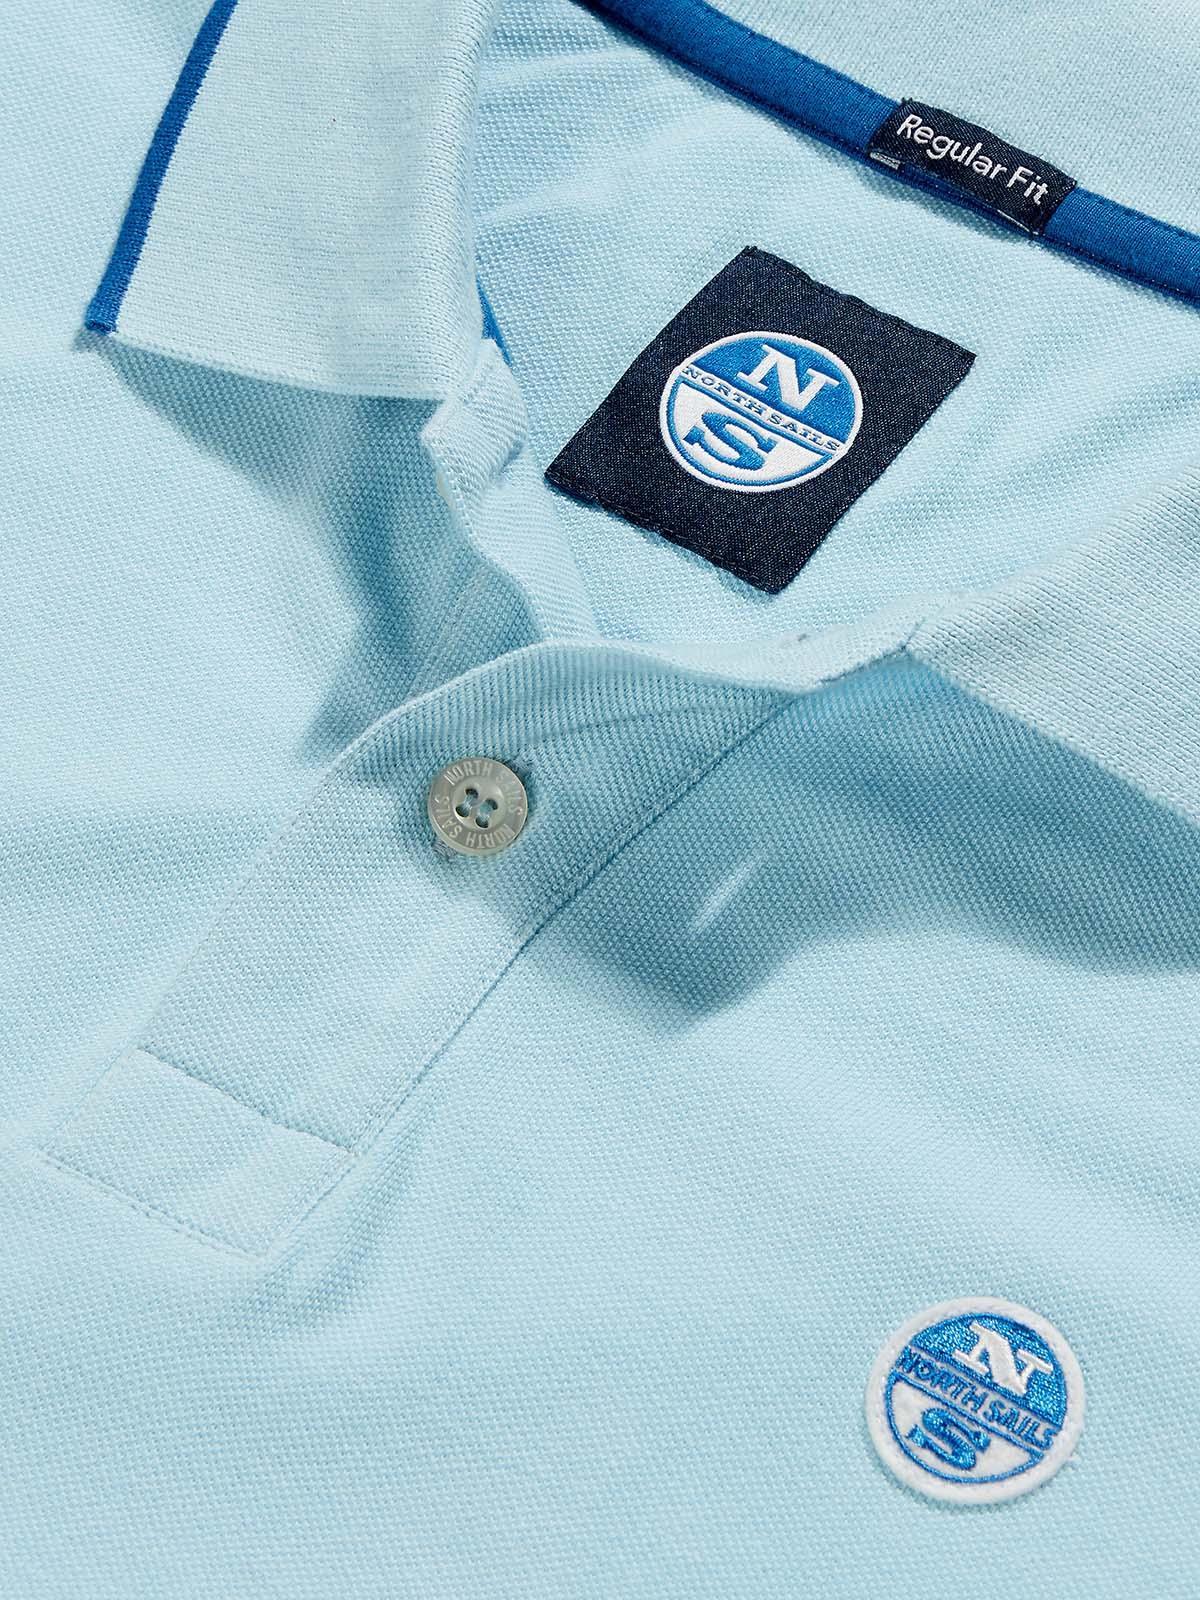 NORTH-SAILS-Mens-Legacy-Heritage-Short-Sleeve-Polo-Shirt-SALE-RRP-50 thumbnail 64